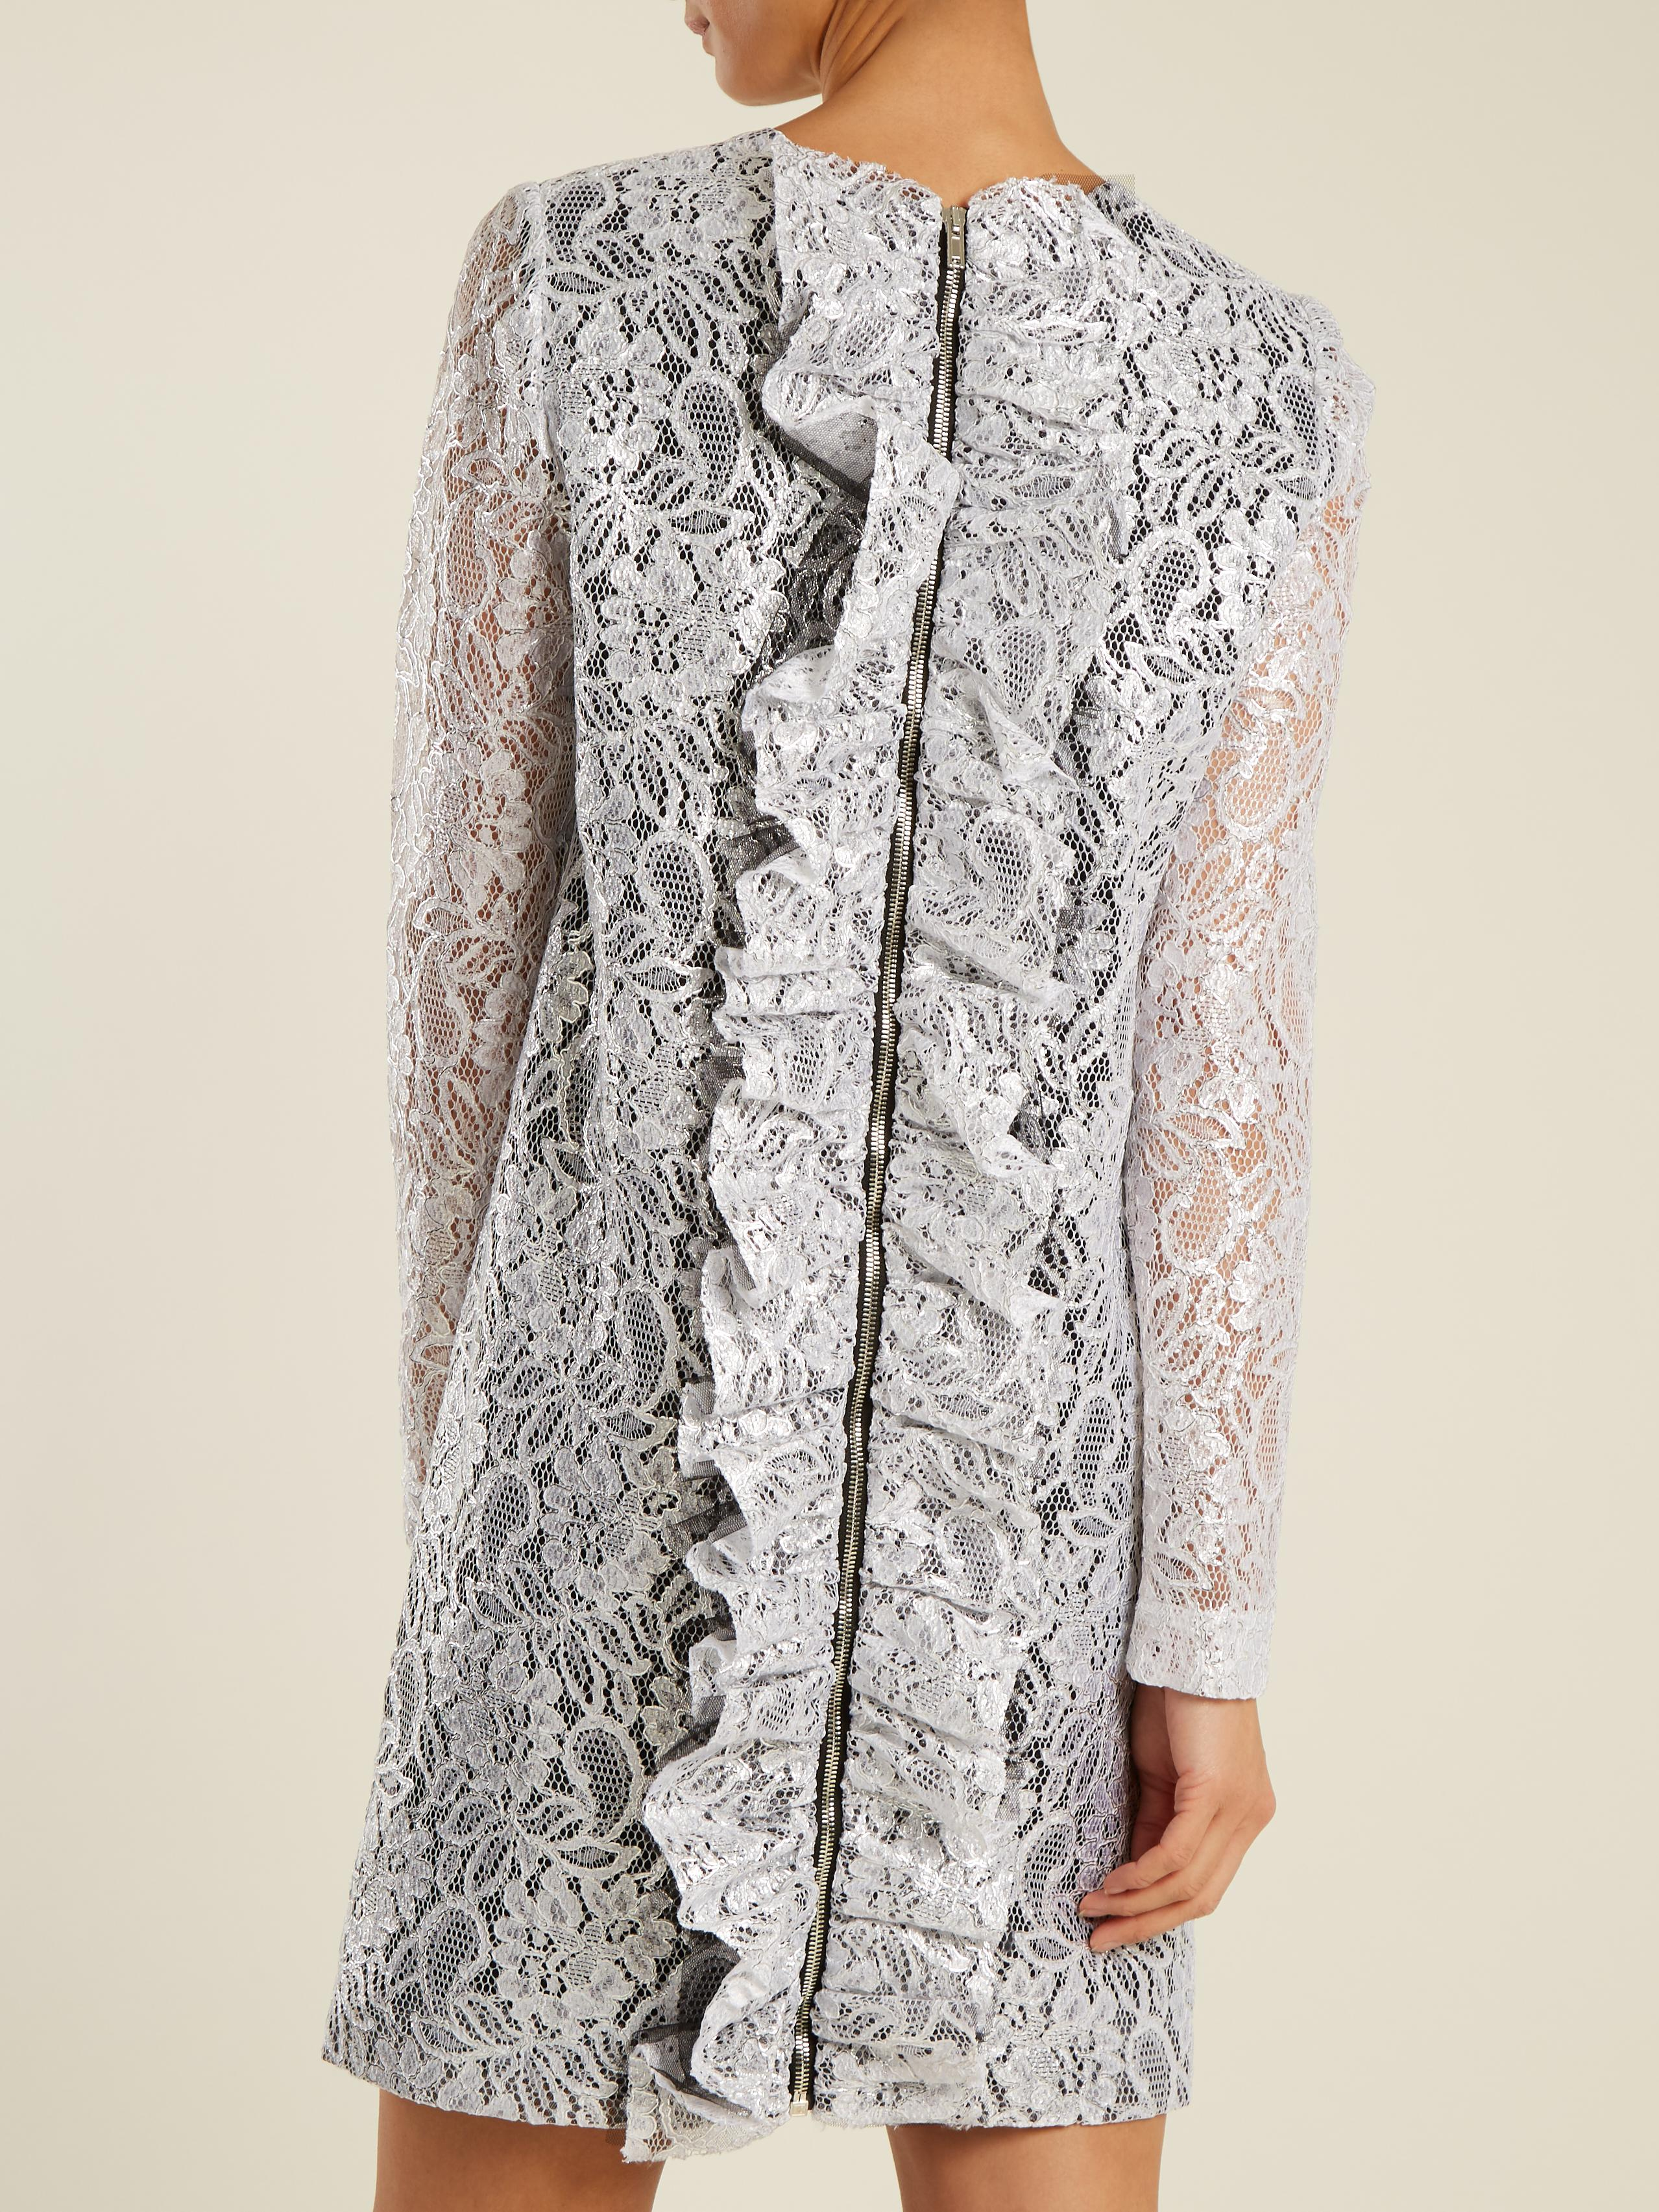 To Buy Coated-lace mini dress Msgm Discount Aaa Cheap Sale Huge Surprise Cheap Sale Online Cheap Sale Geniue Stockist pMPS9